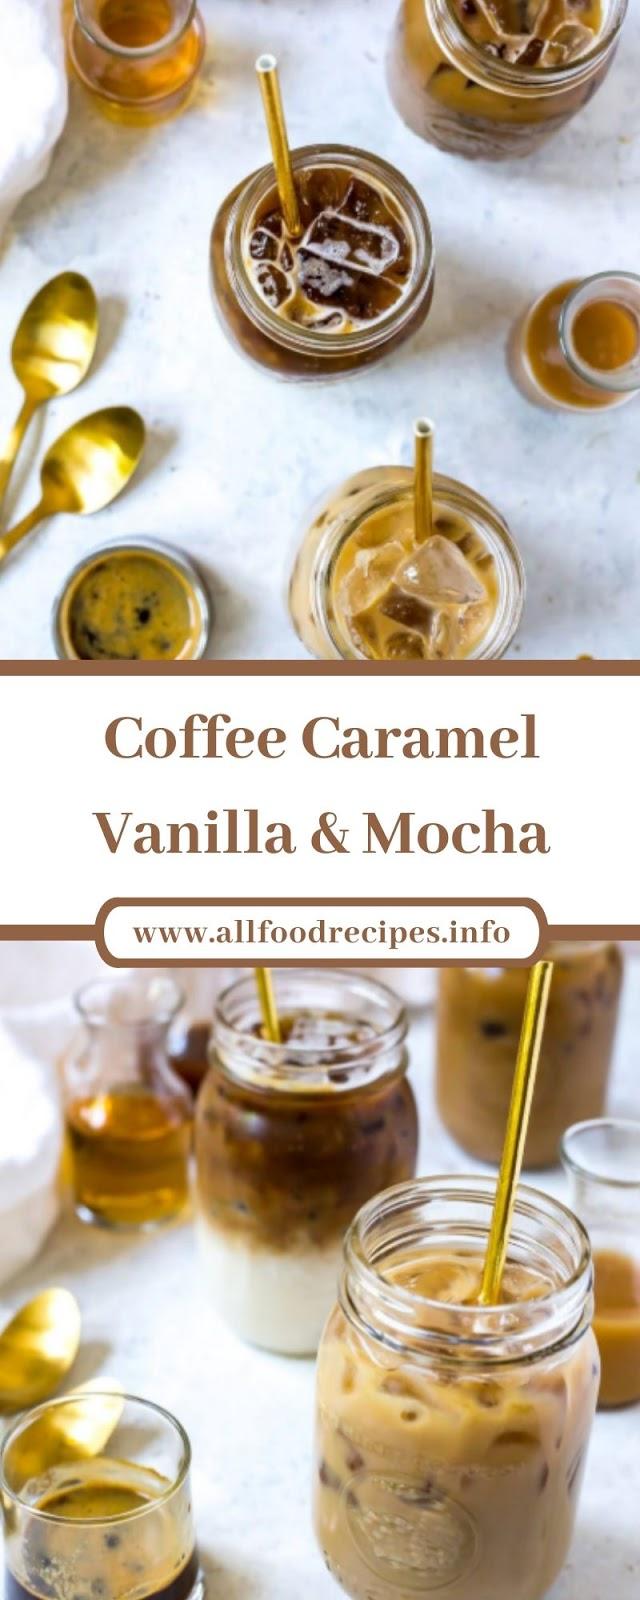 Coffee Caramel Vanilla & Mocha